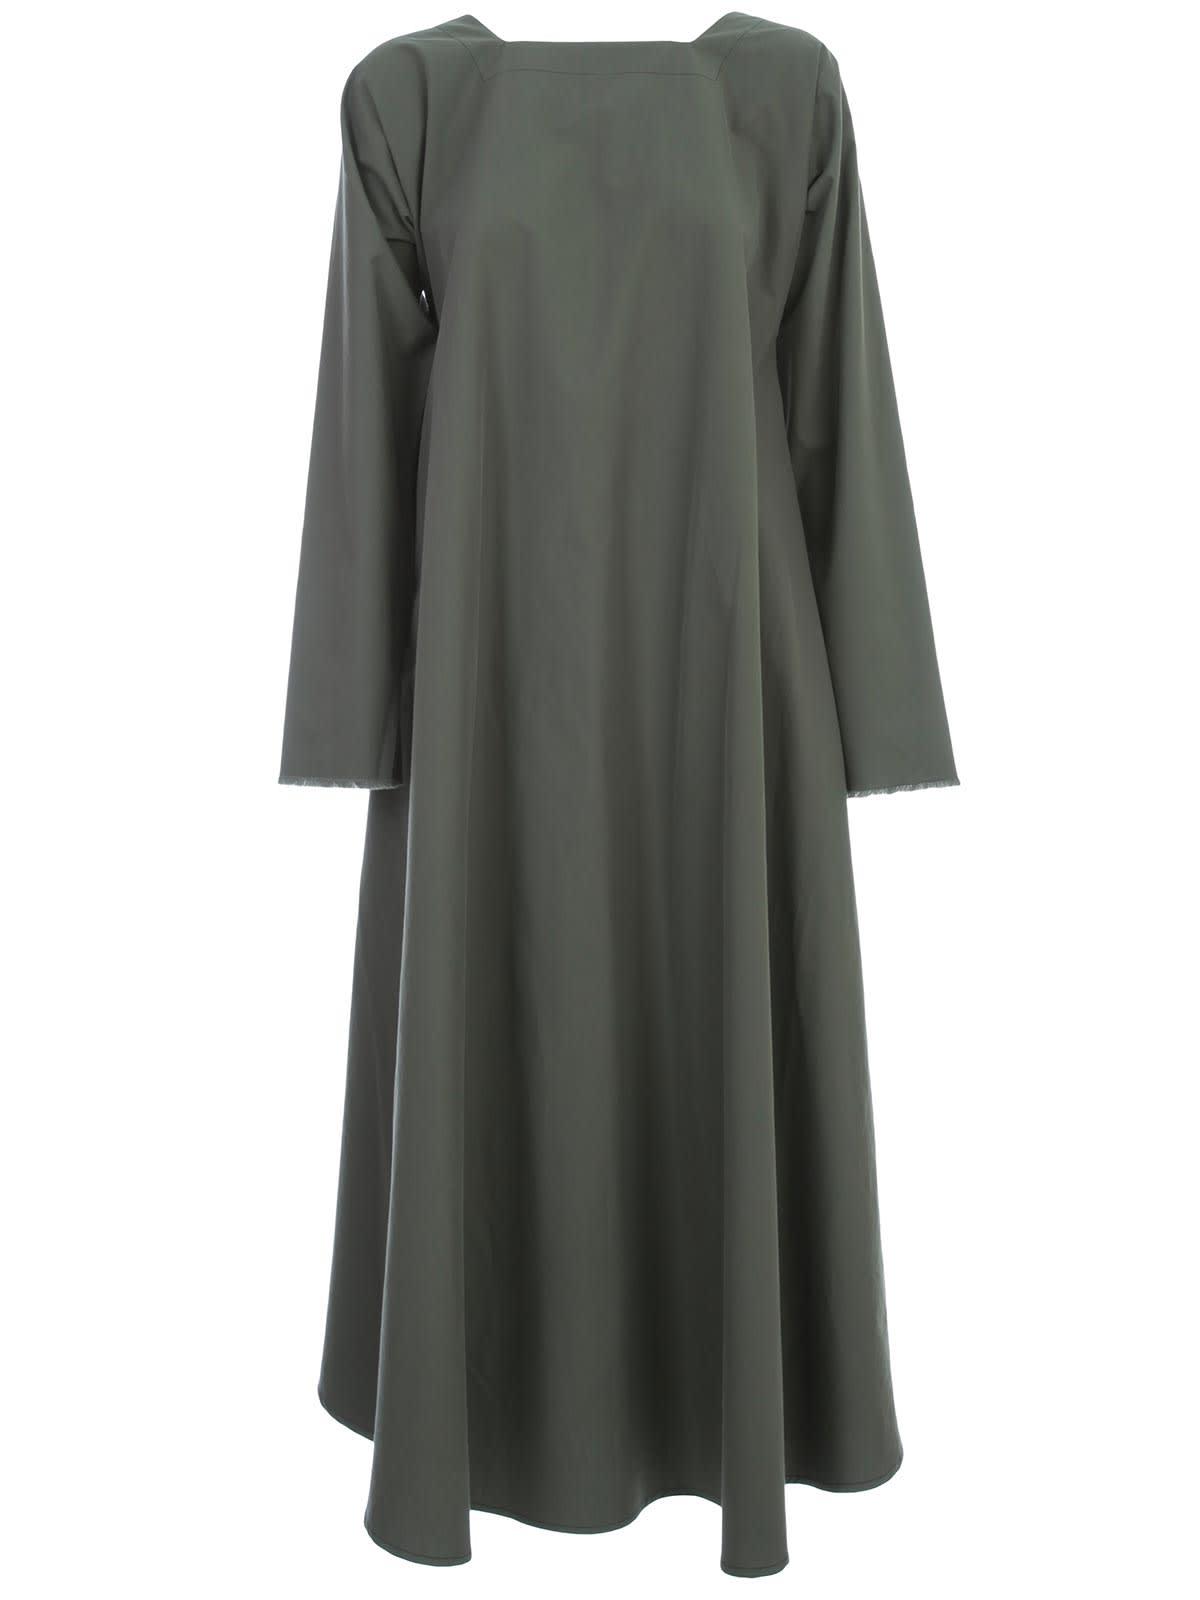 Buy Daniela Gregis Olma Dress Square Neck online, shop Daniela Gregis with free shipping